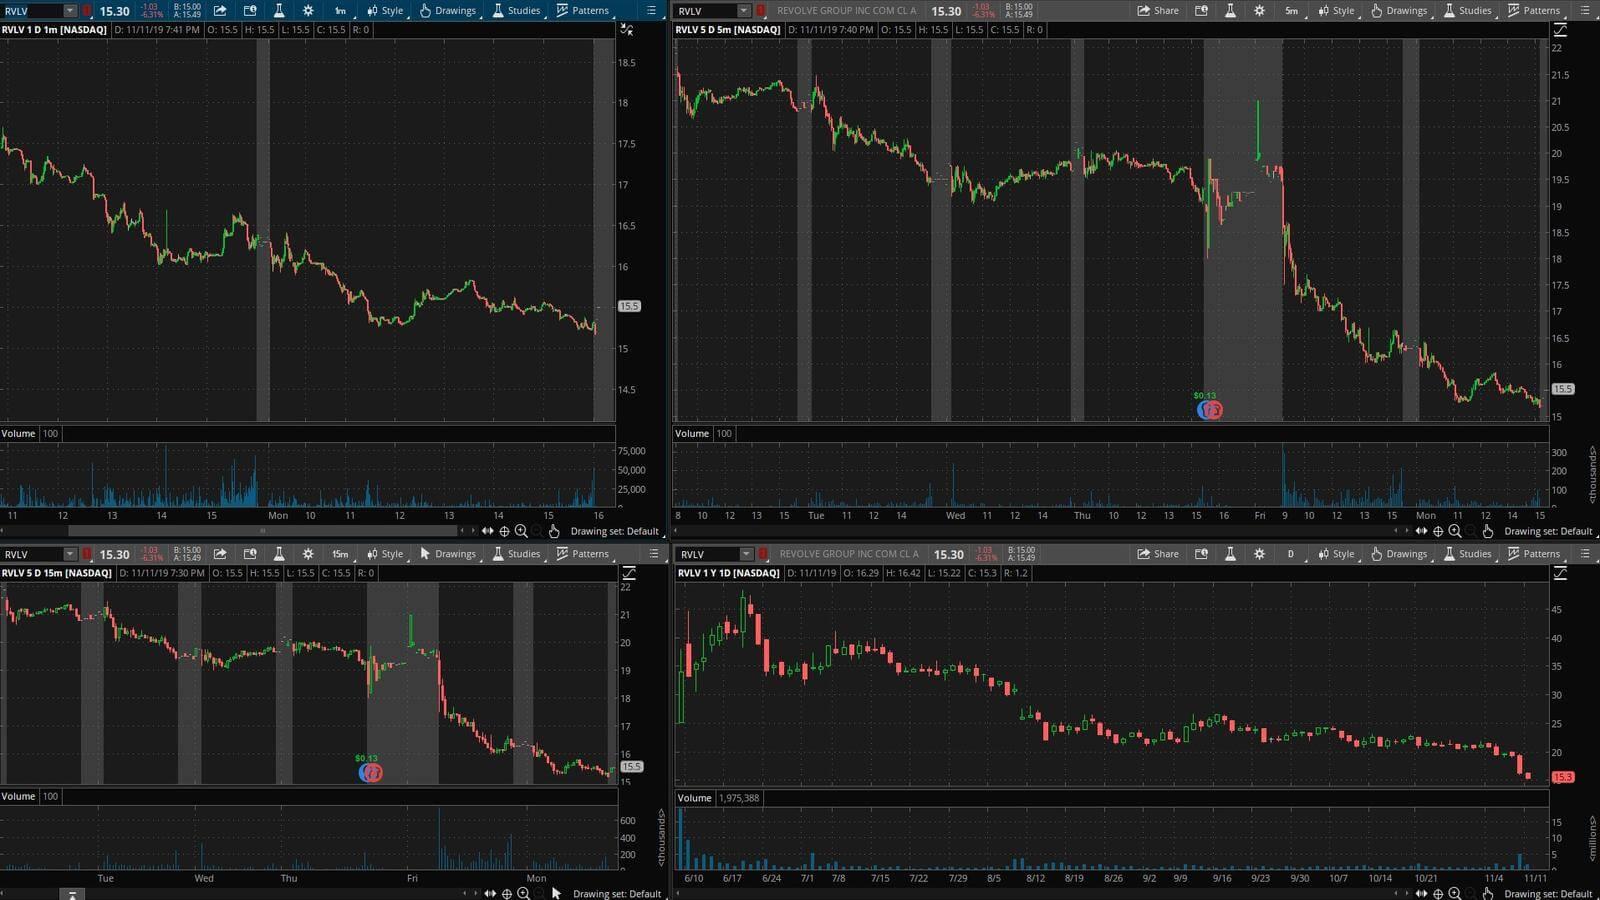 RVLV - график акции на фондовой бирже